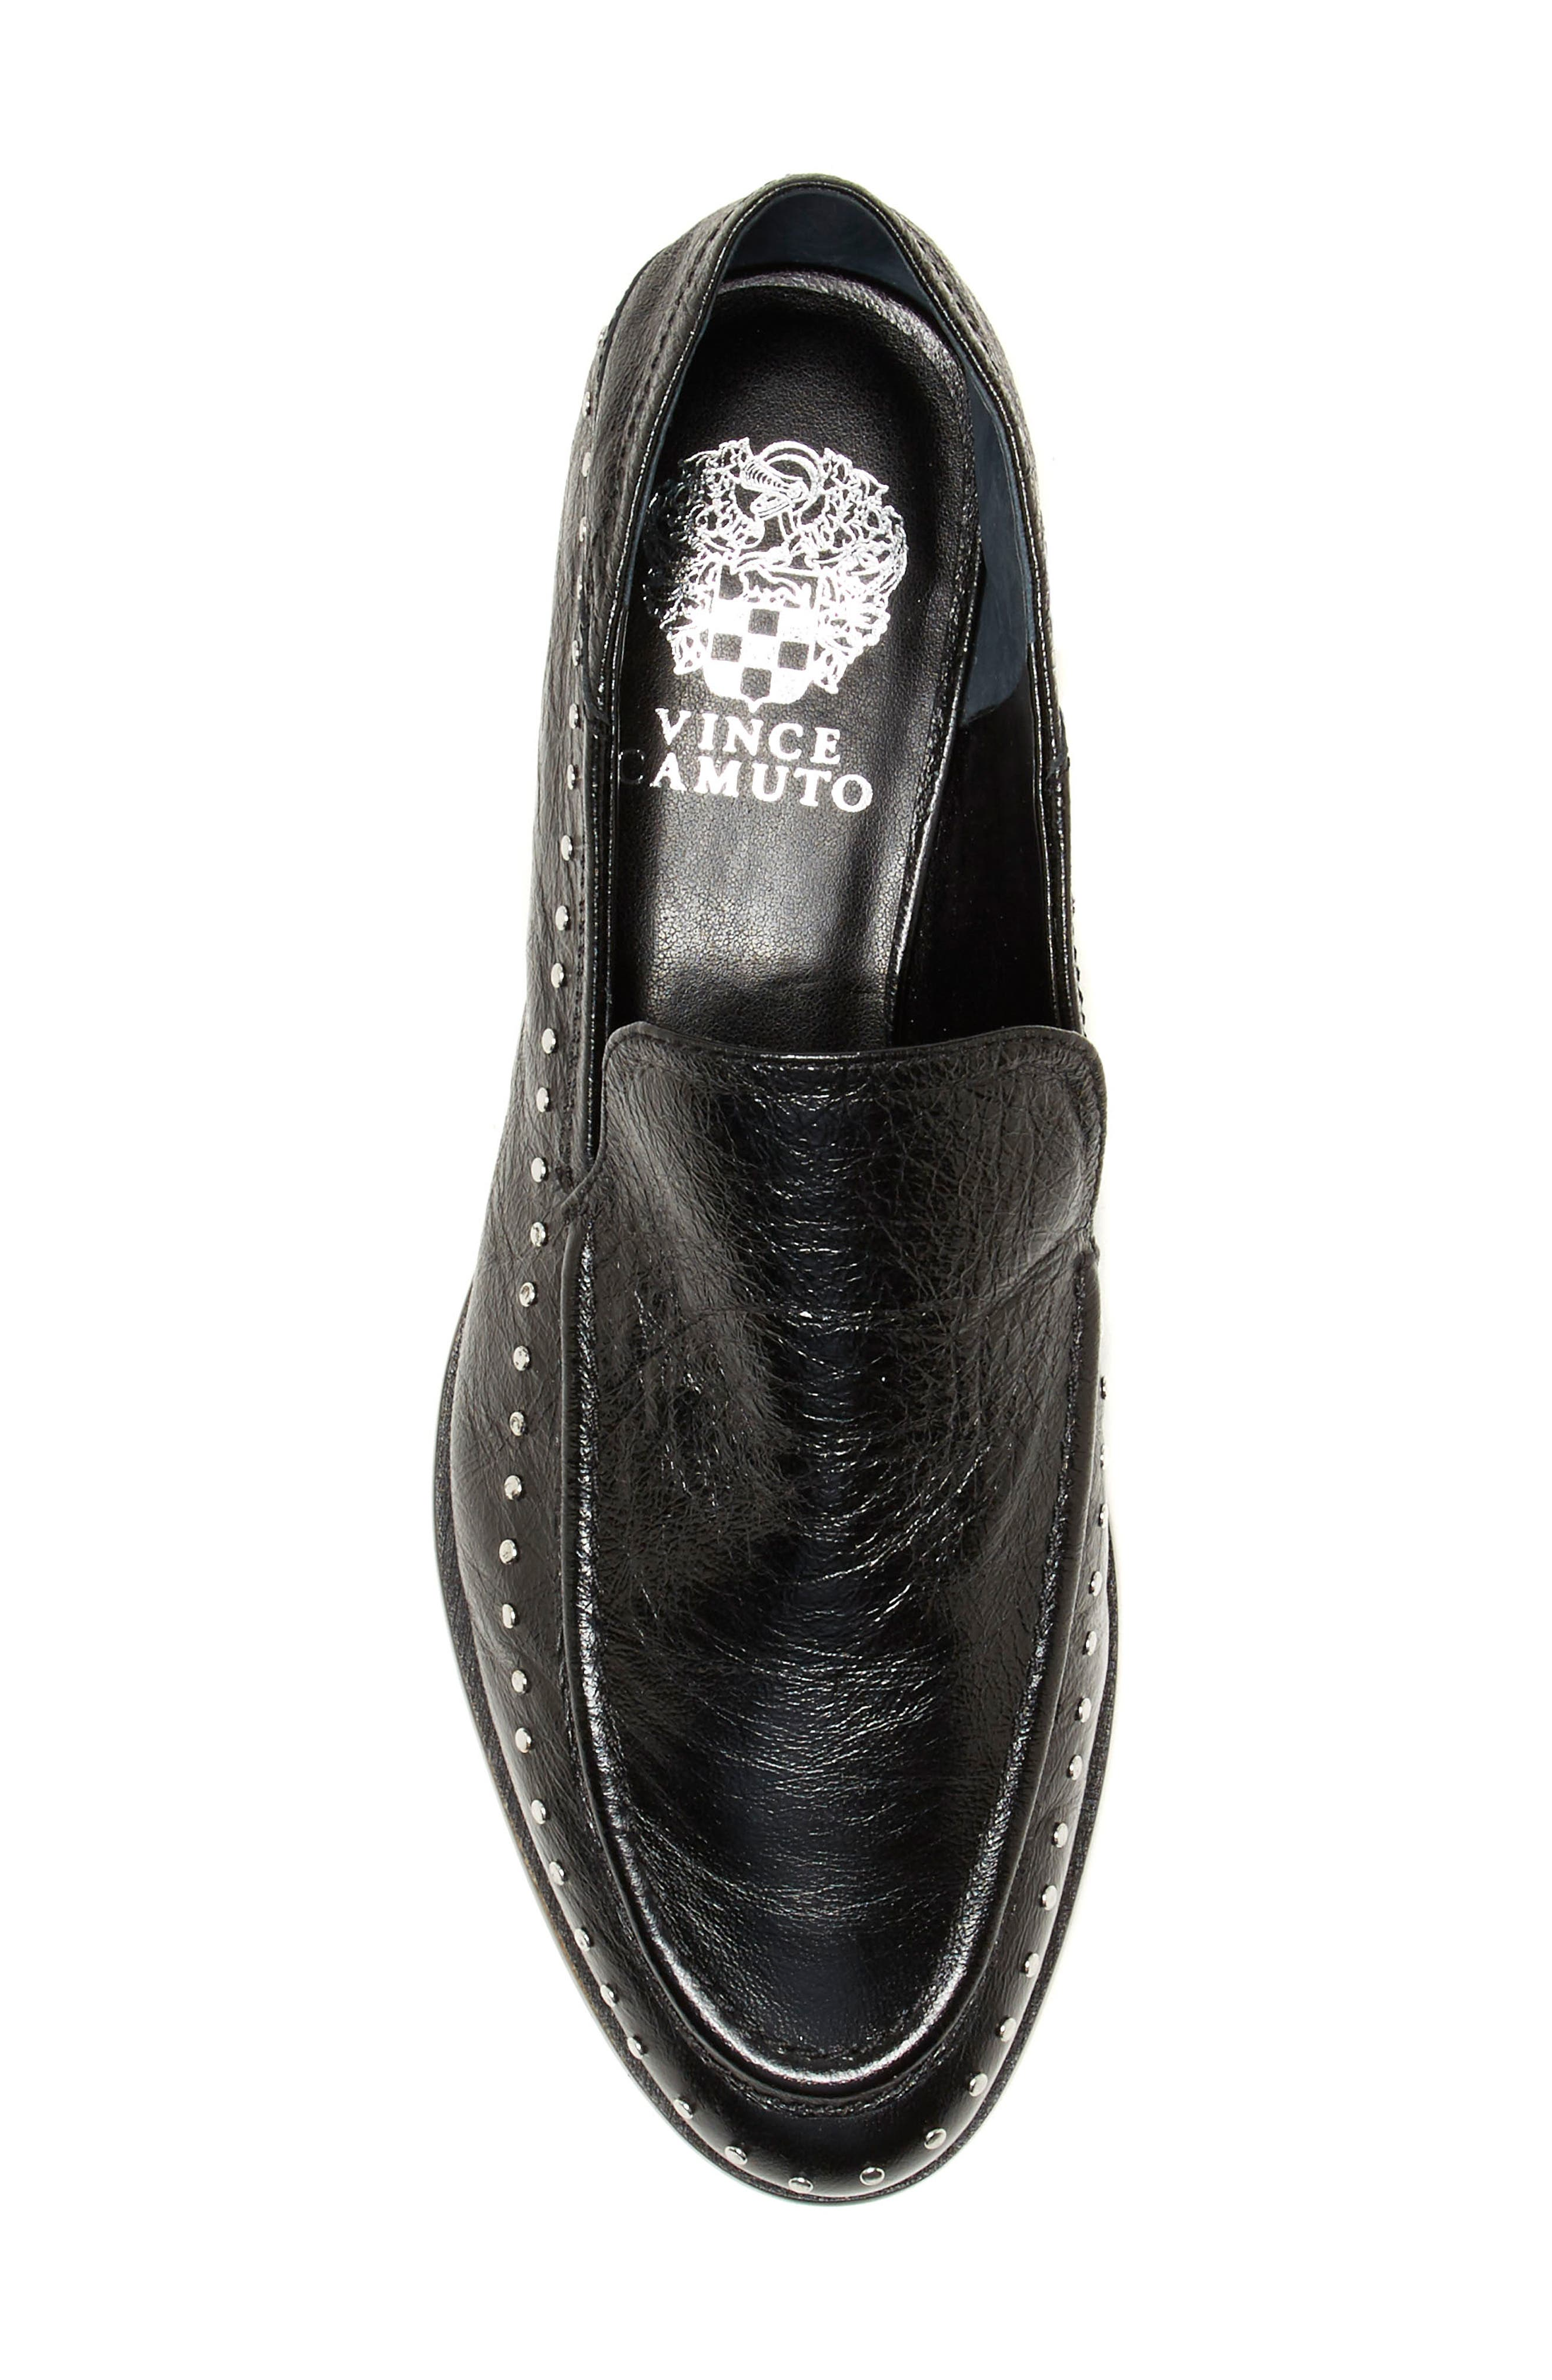 Jendeya Convertible Studded Loafer,                             Alternate thumbnail 6, color,                             001